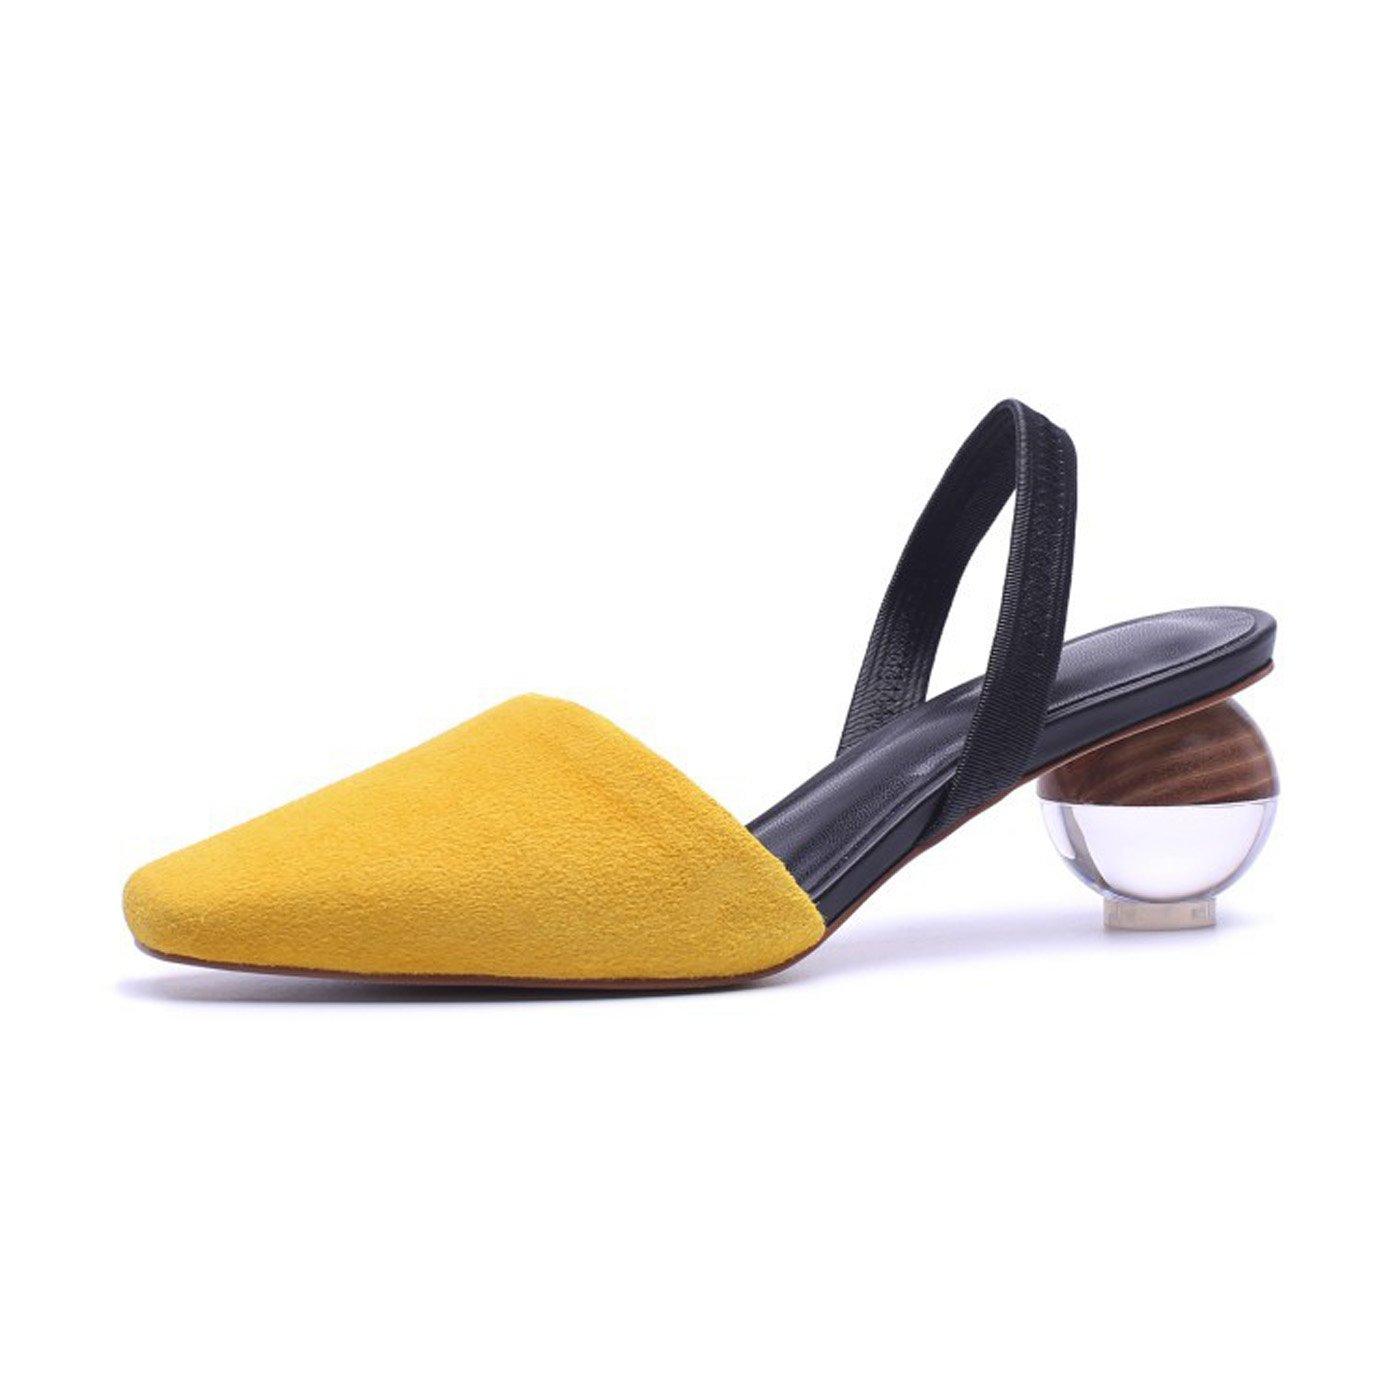 ZXMXY Damenschuhe Sommer Comfort Sandaleen Seltsame Kreative Ferse Spitzschuh Für Outdoor Weiß Gelb Sandaleen im Freien